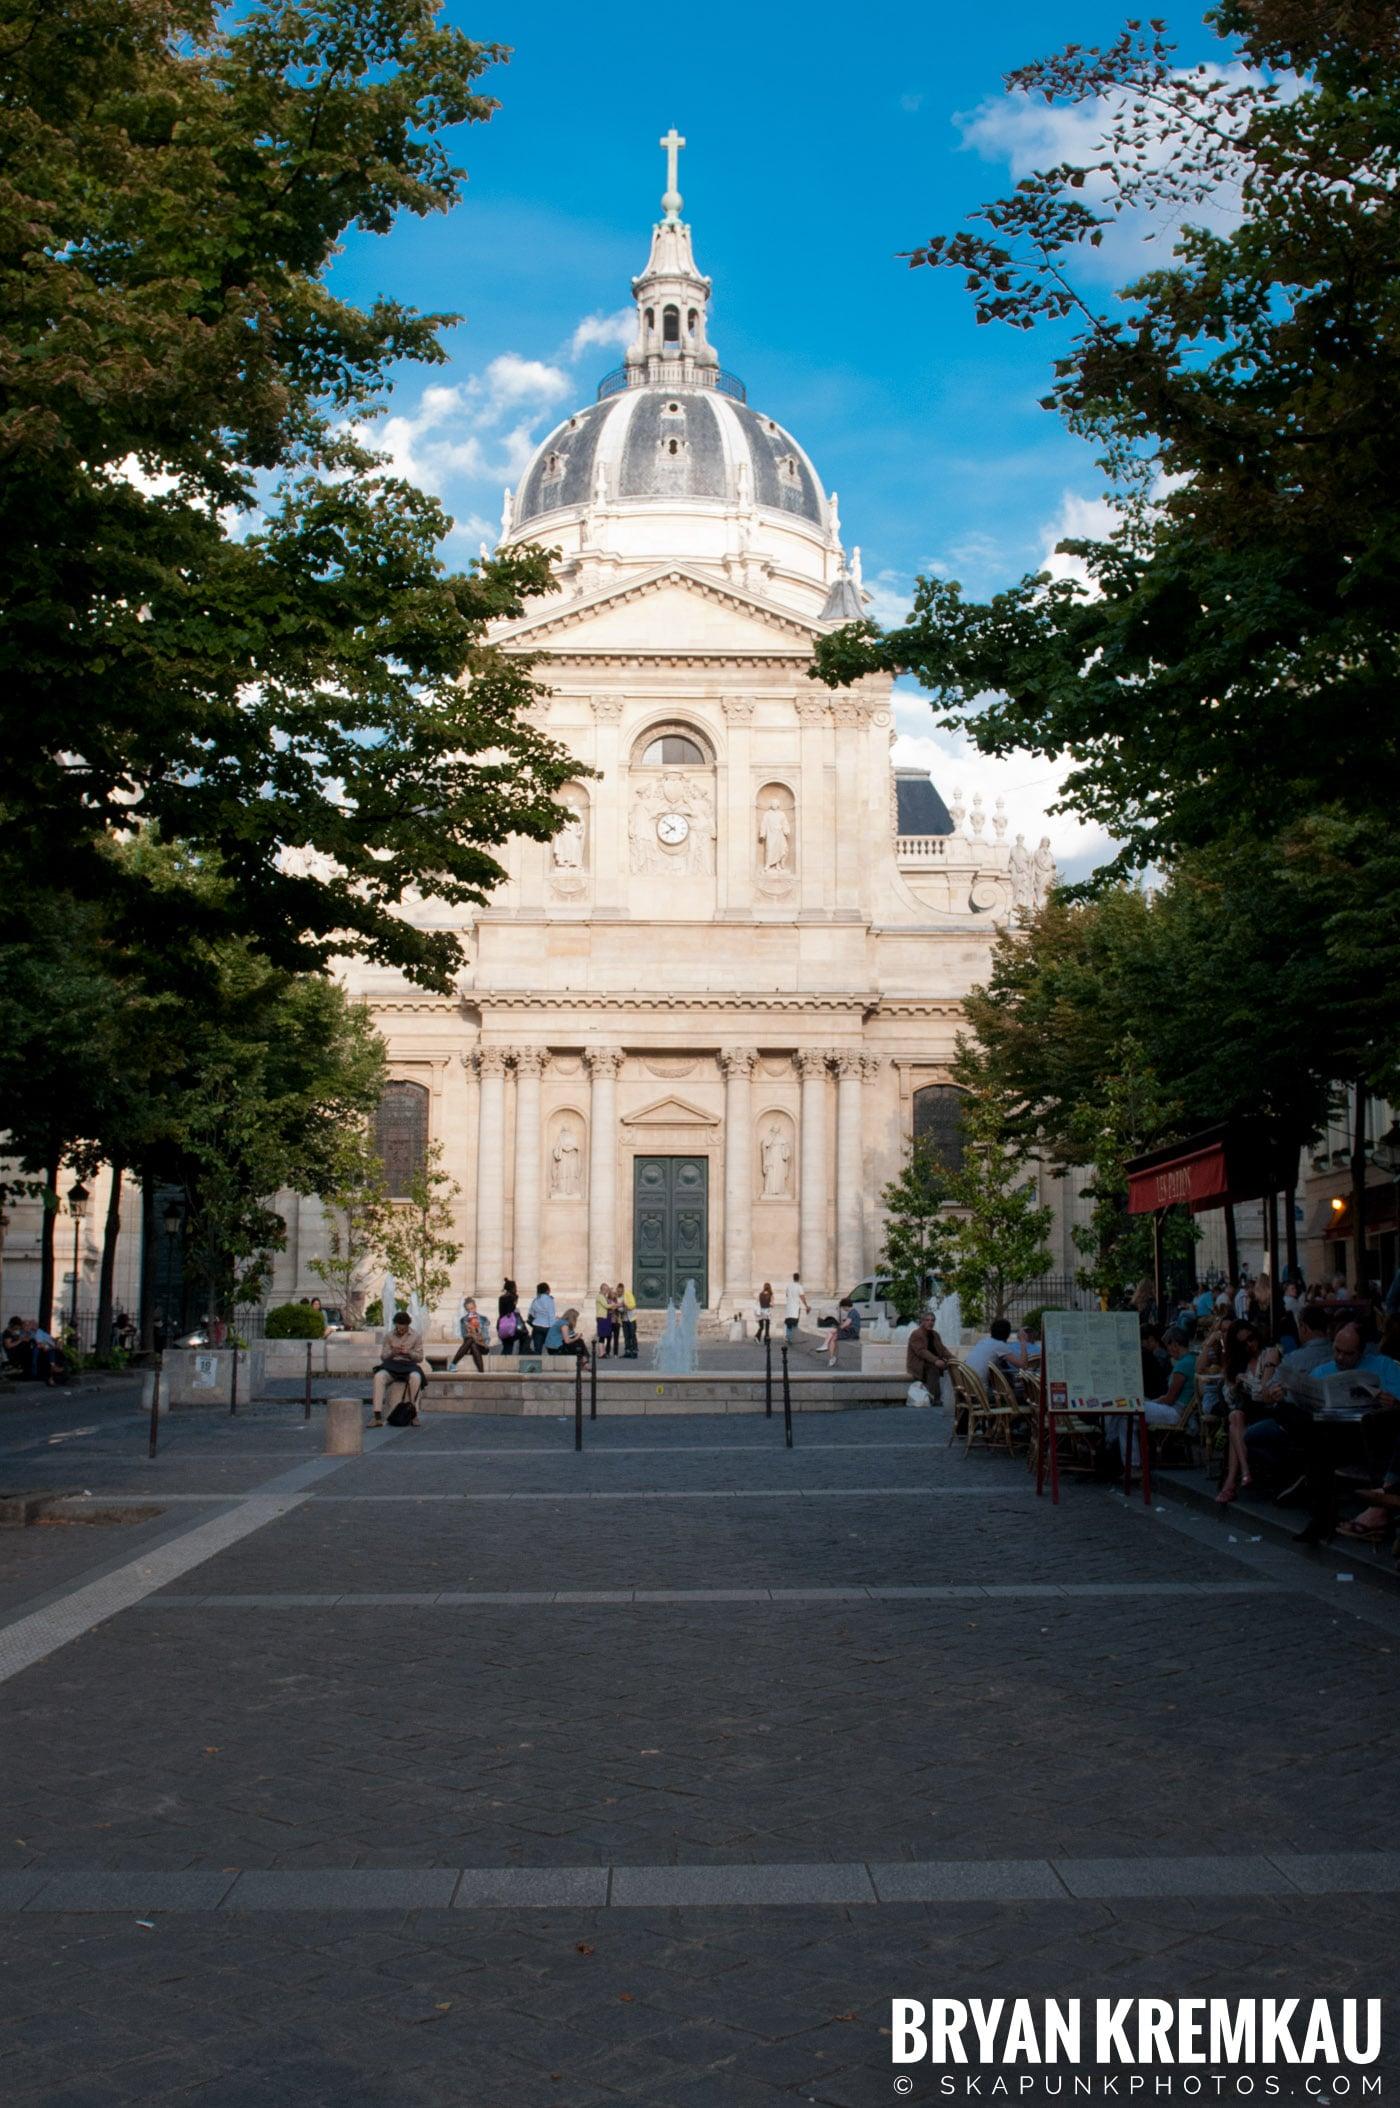 Paris, France Honeymoon - Day 8 - 7.25.11 (6)